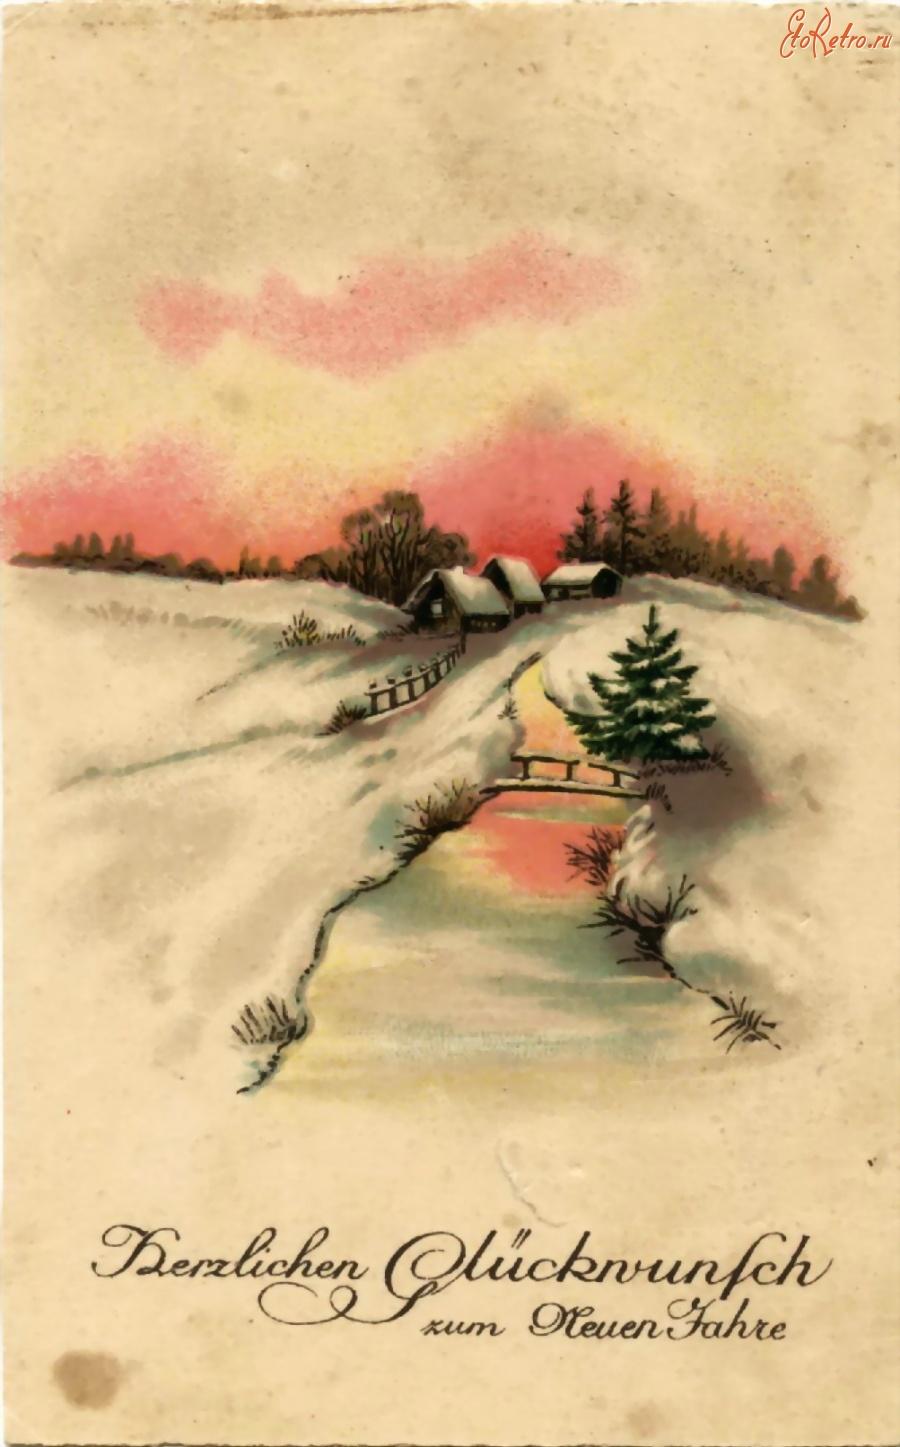 открытки 1935г безусловно